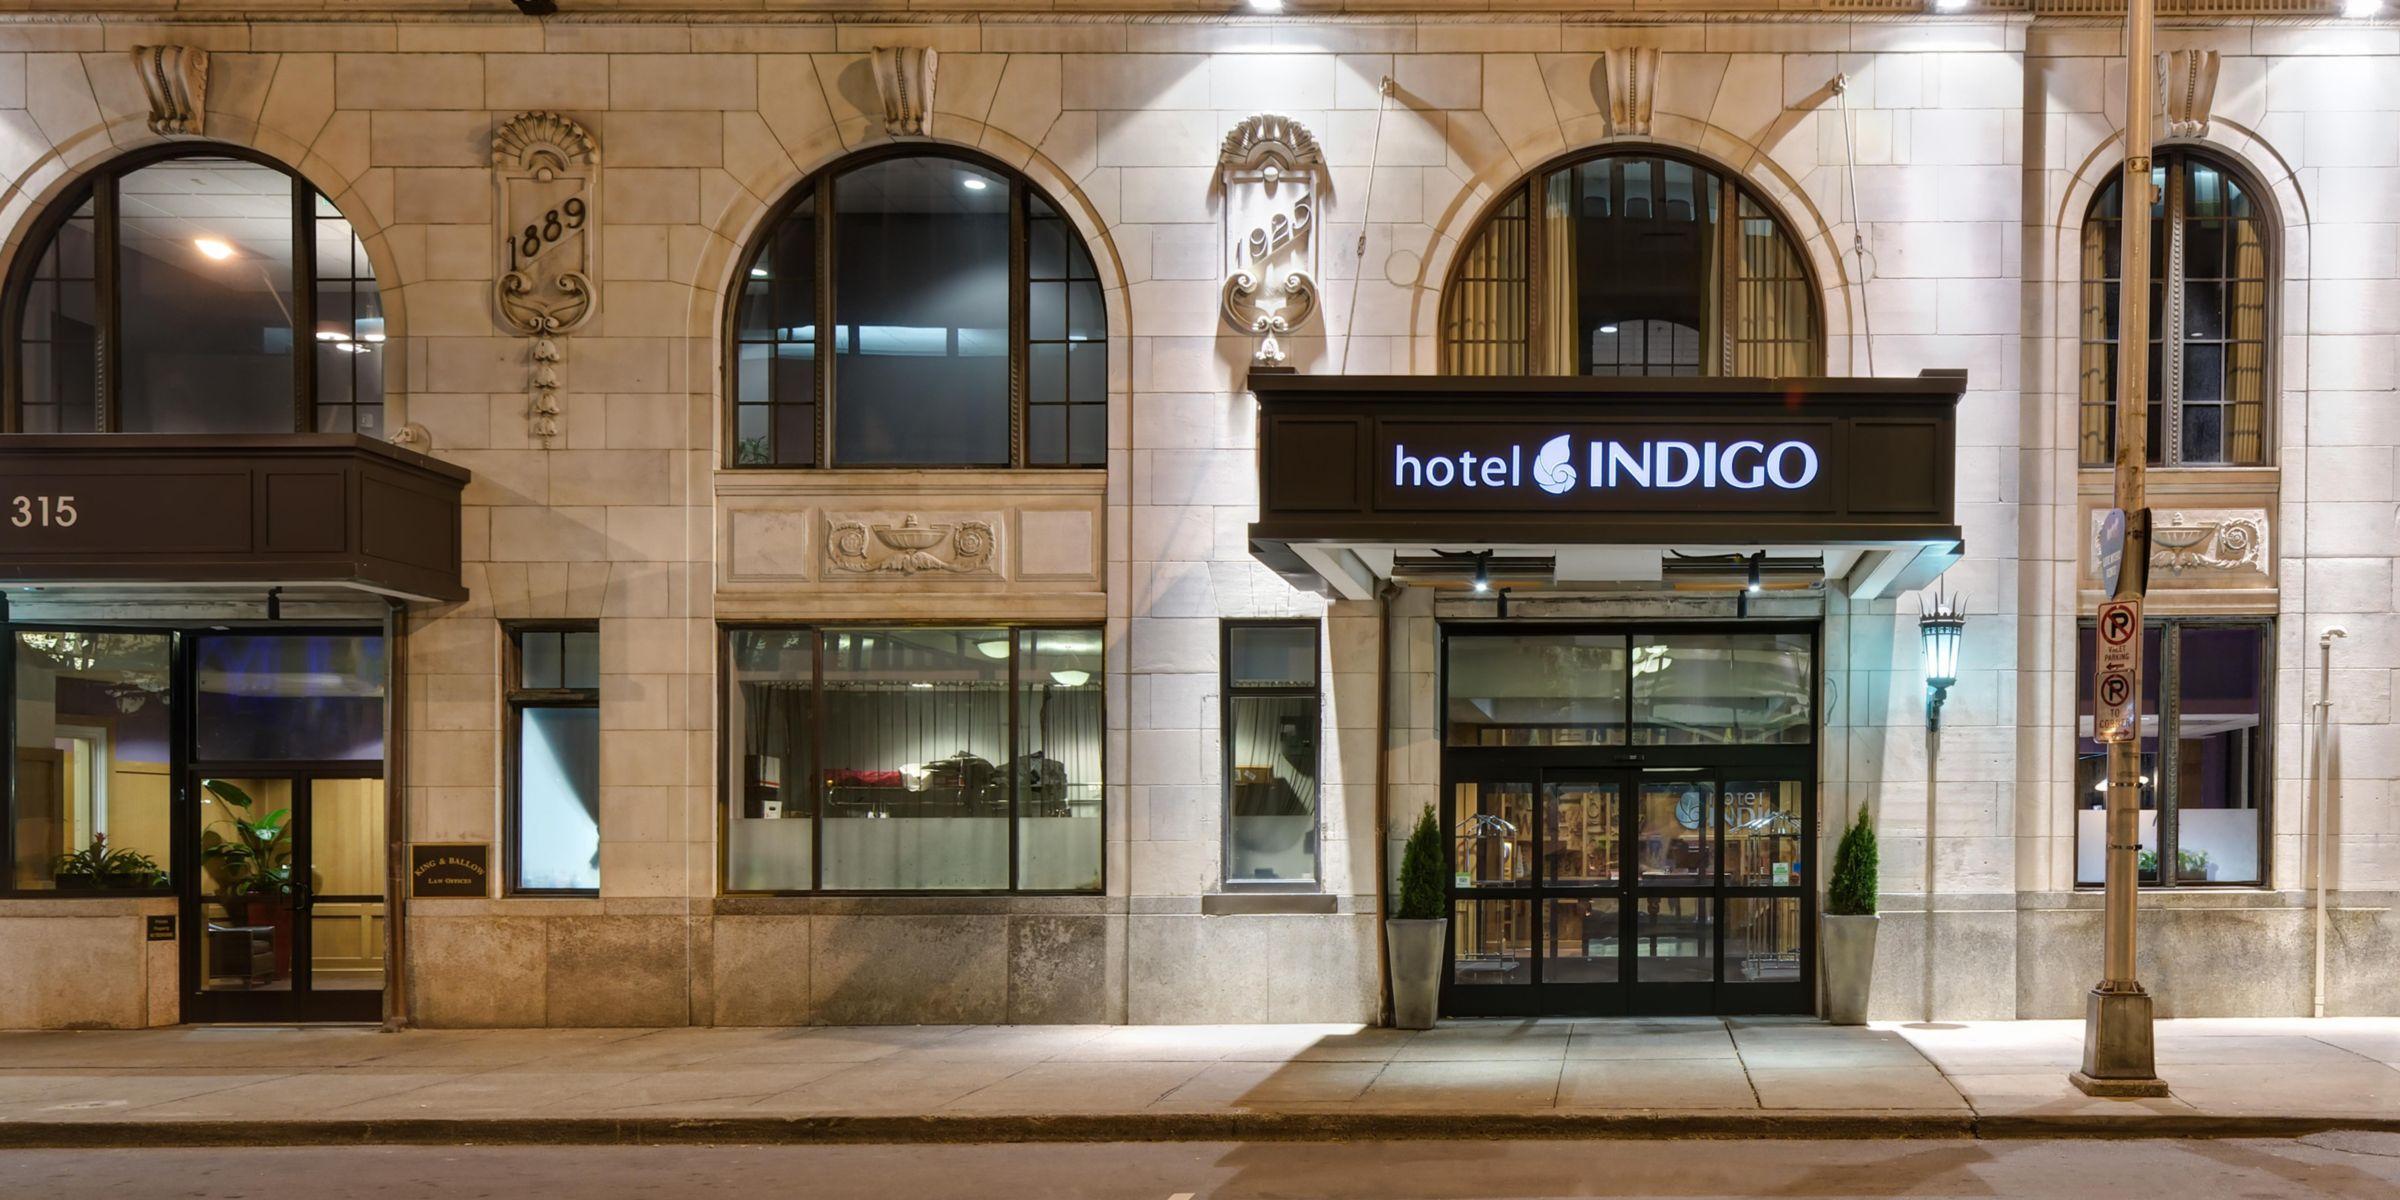 Hotel Indigo Nashville - Nashville, Tennessee